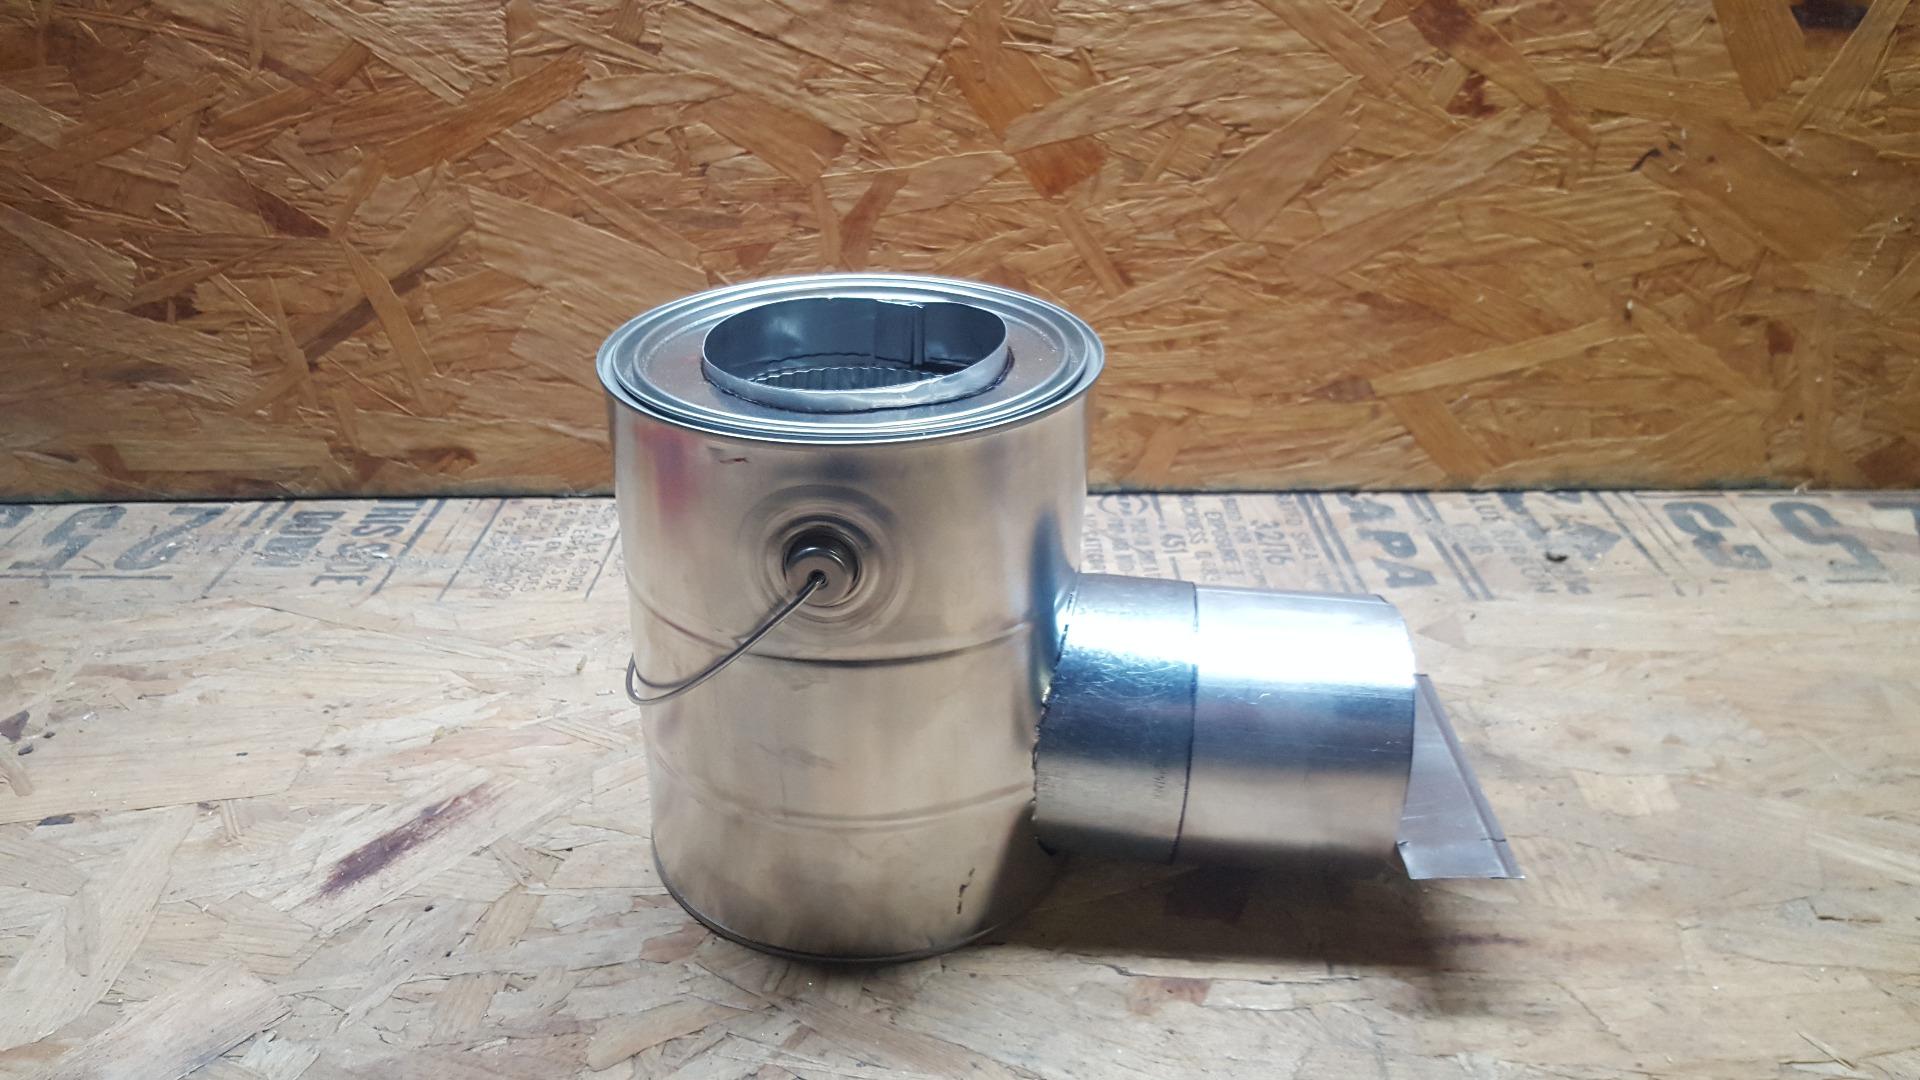 Under $20 Rocket Stove/Heater